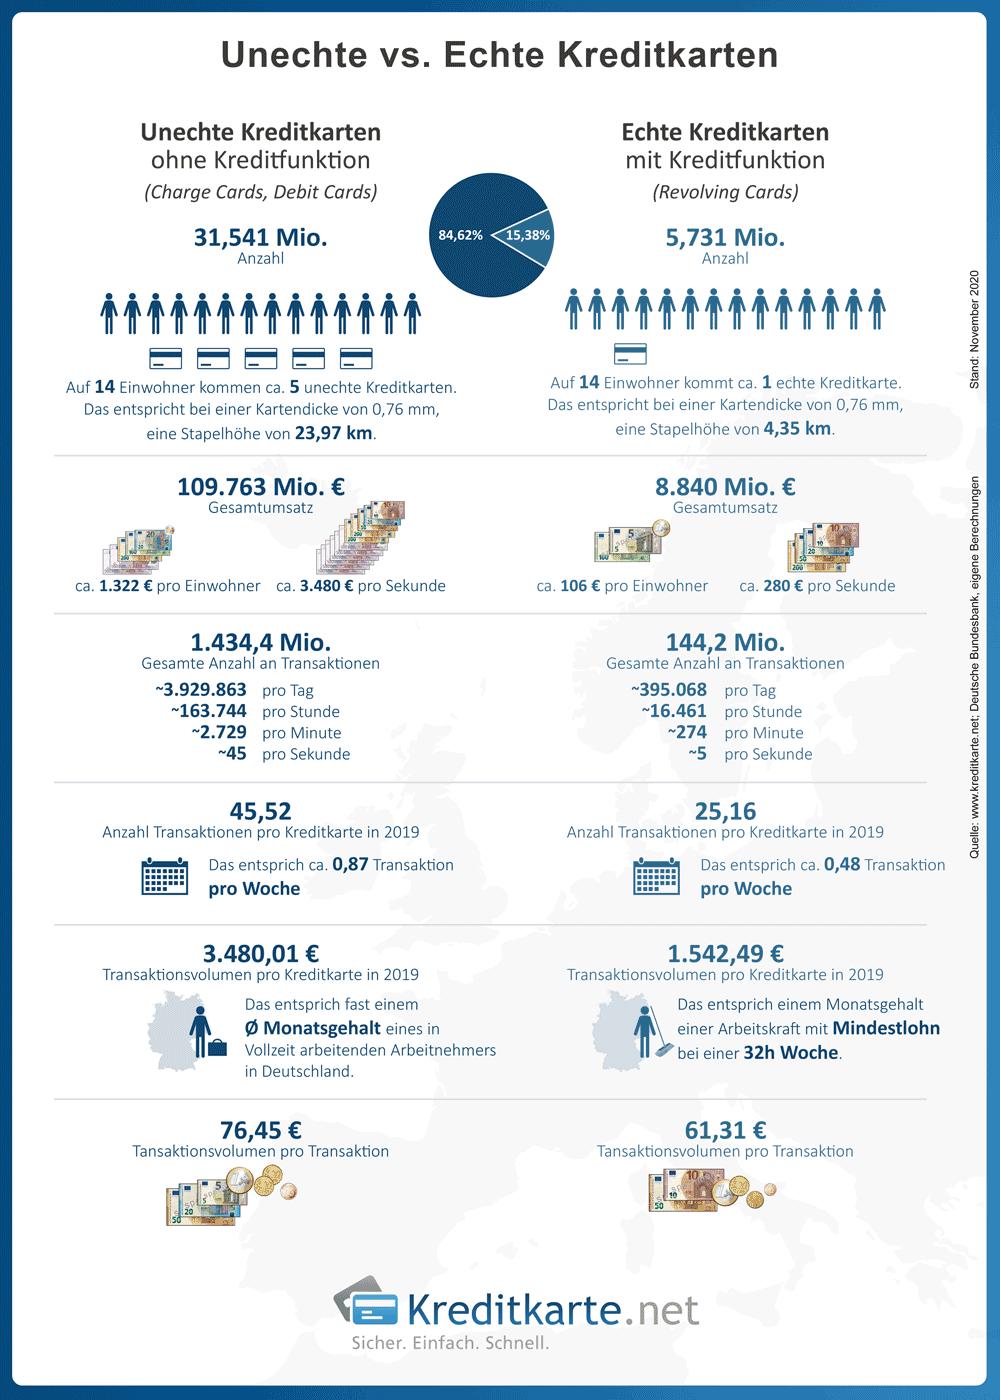 infografik-unechte-echte-kreditkarten-vergleich